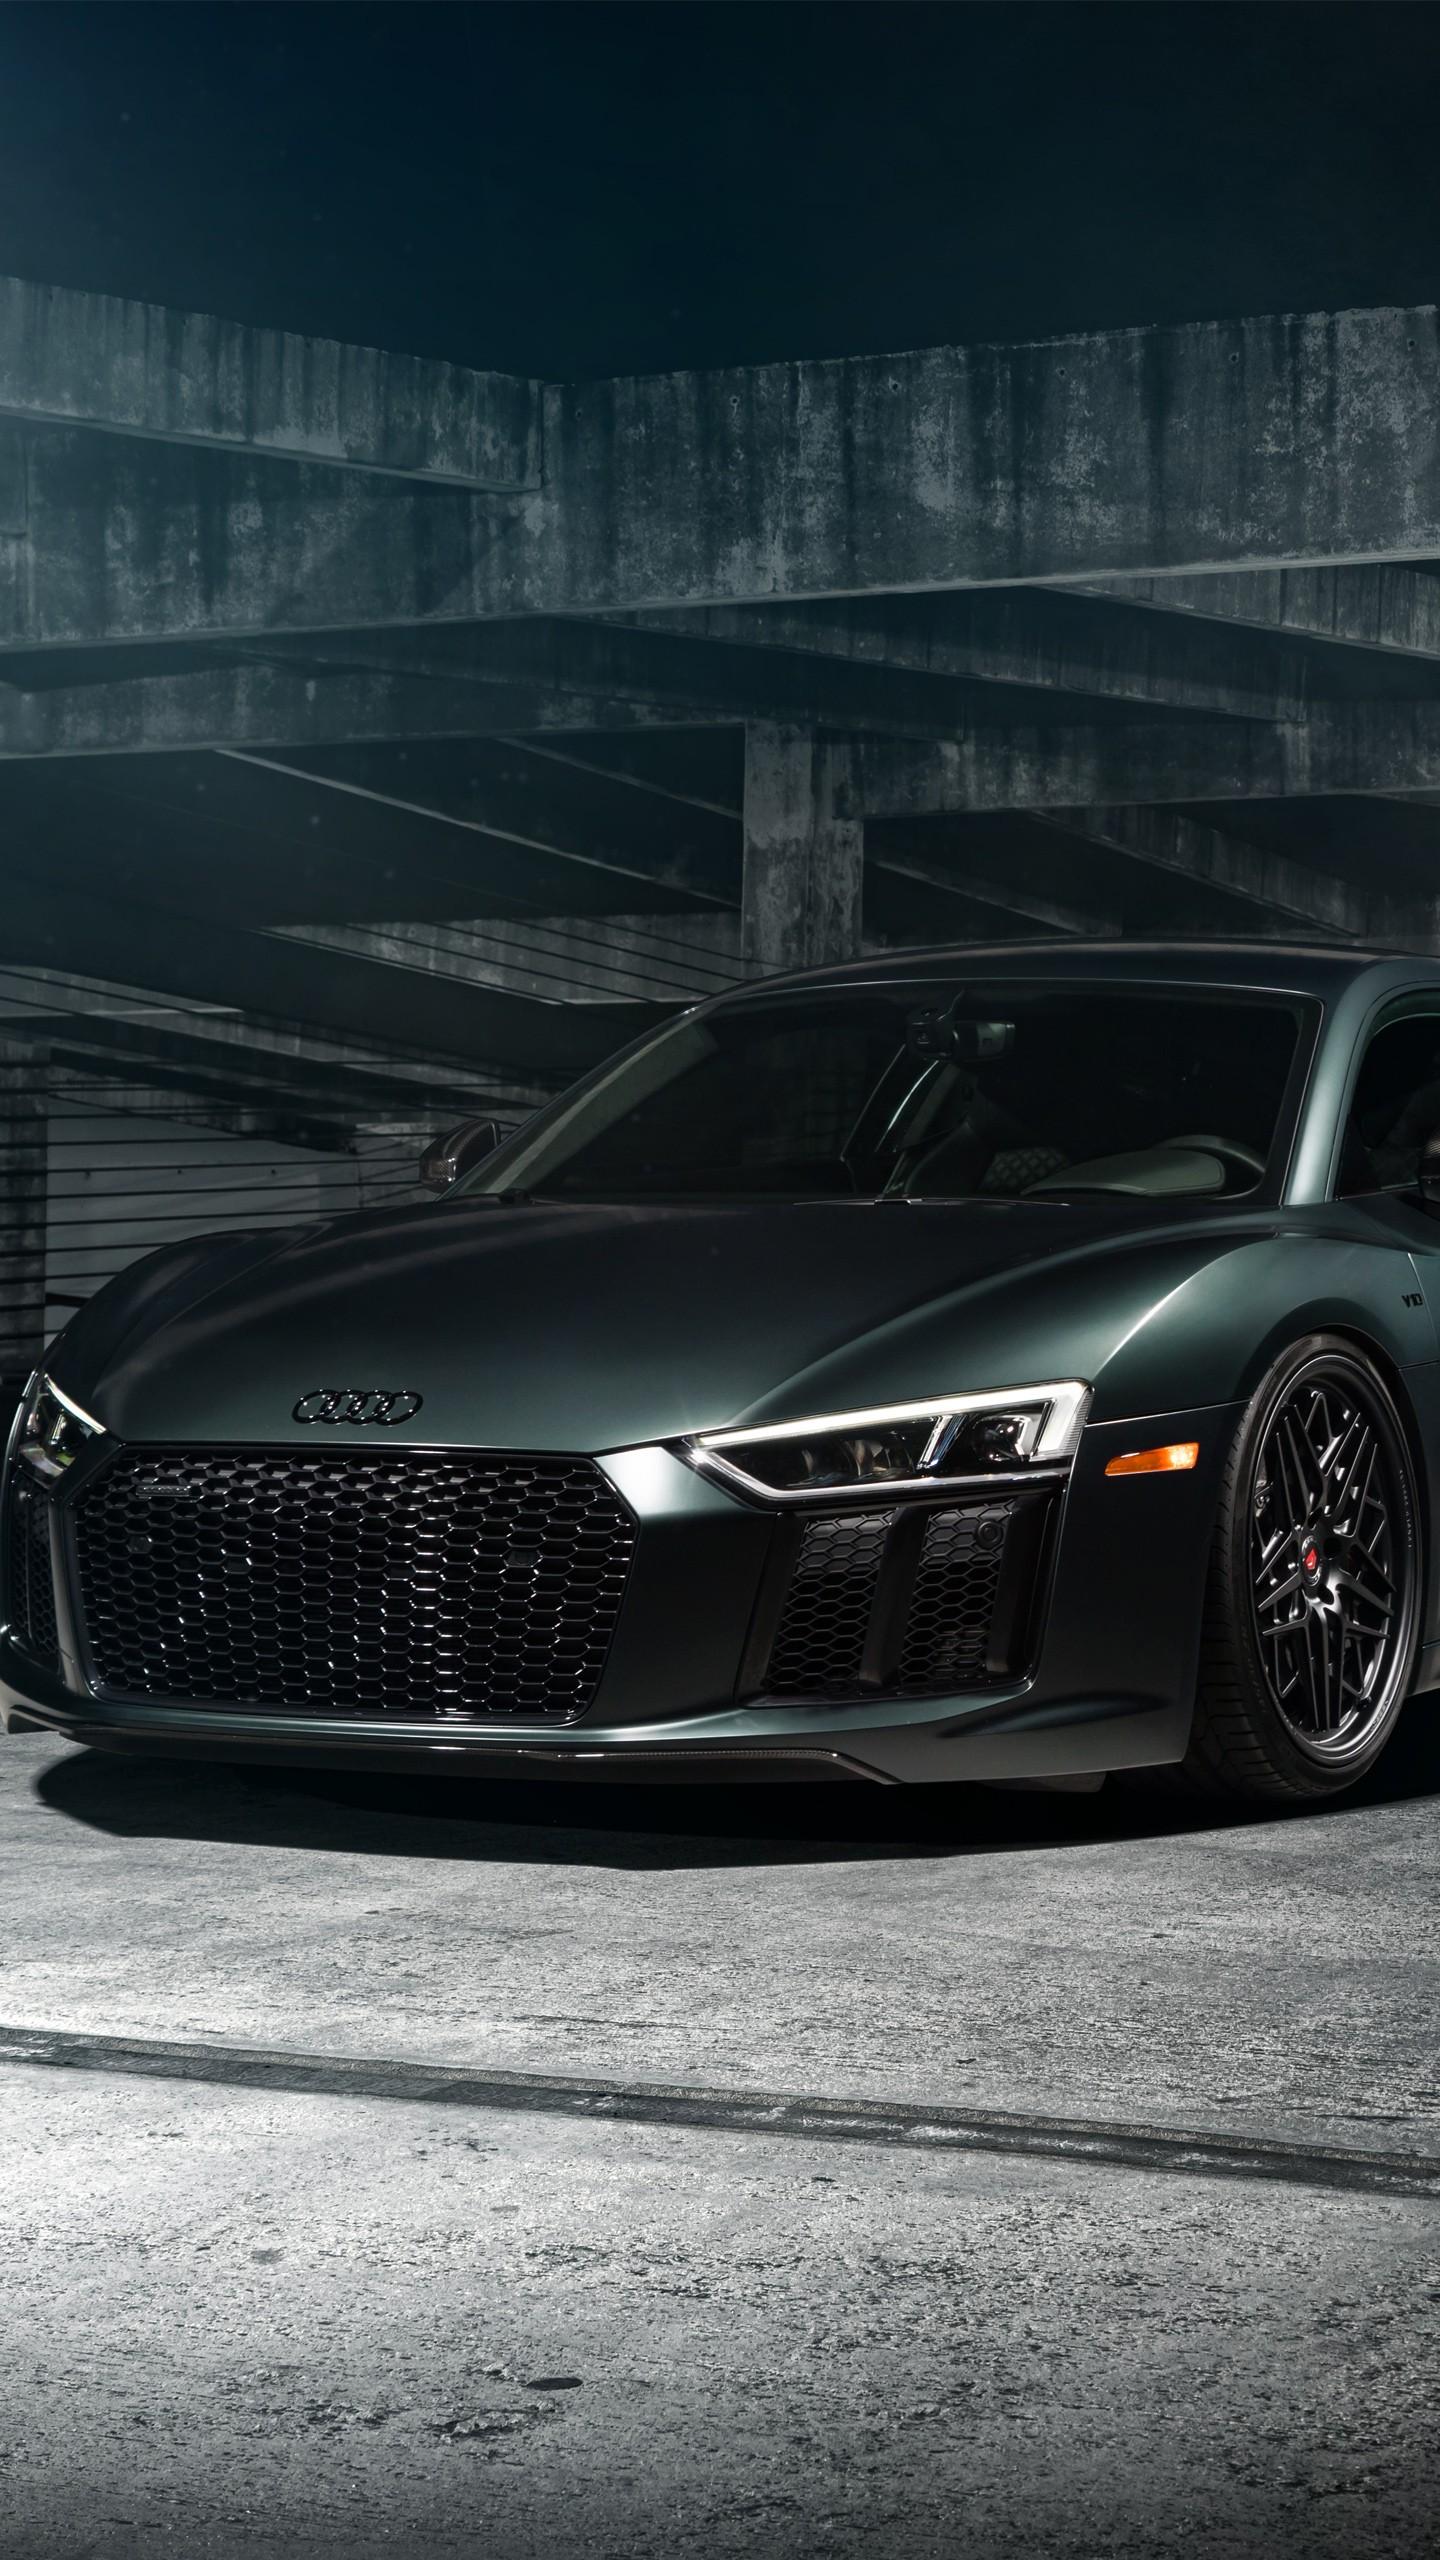 Audi Car Full Hd Wallpaper Download Audi R8 On Vossen Wheels Hd 5k Wallpapers Hd Wallpapers